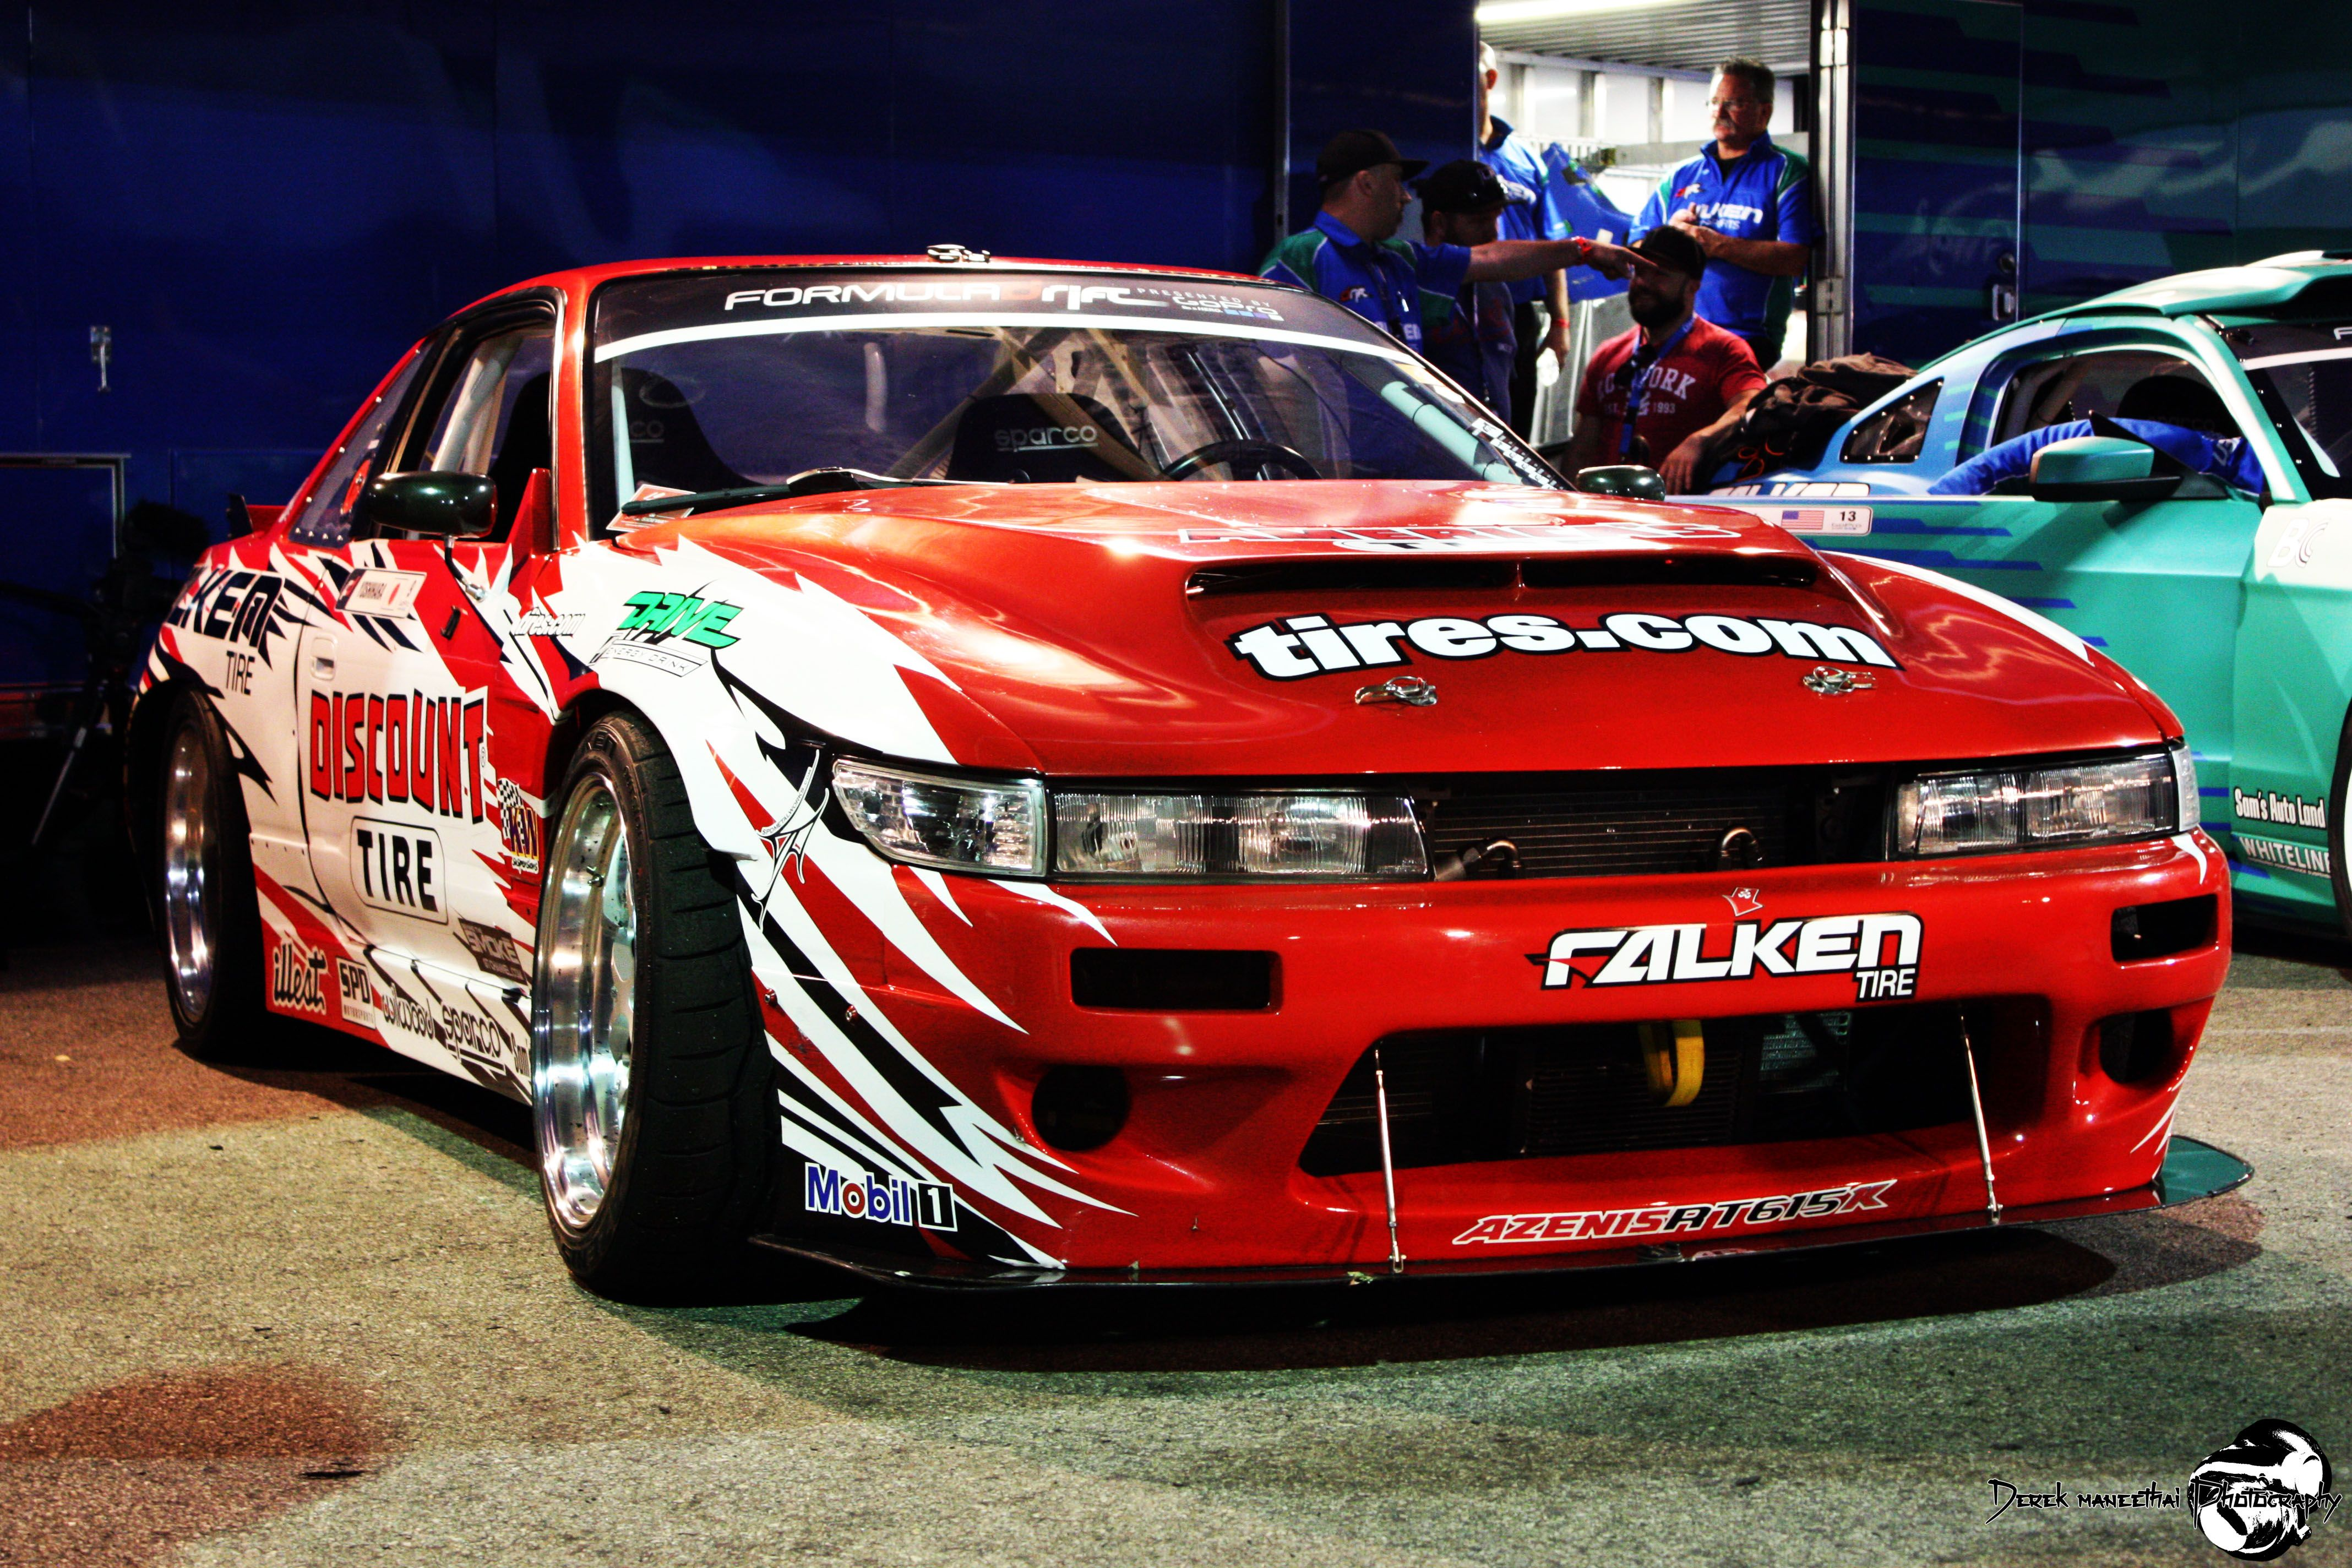 Dai Yoshihara S S13 Nissan Silvia Formula D Irwindale 2013 Cars Drift Drift Cars Falken Tires